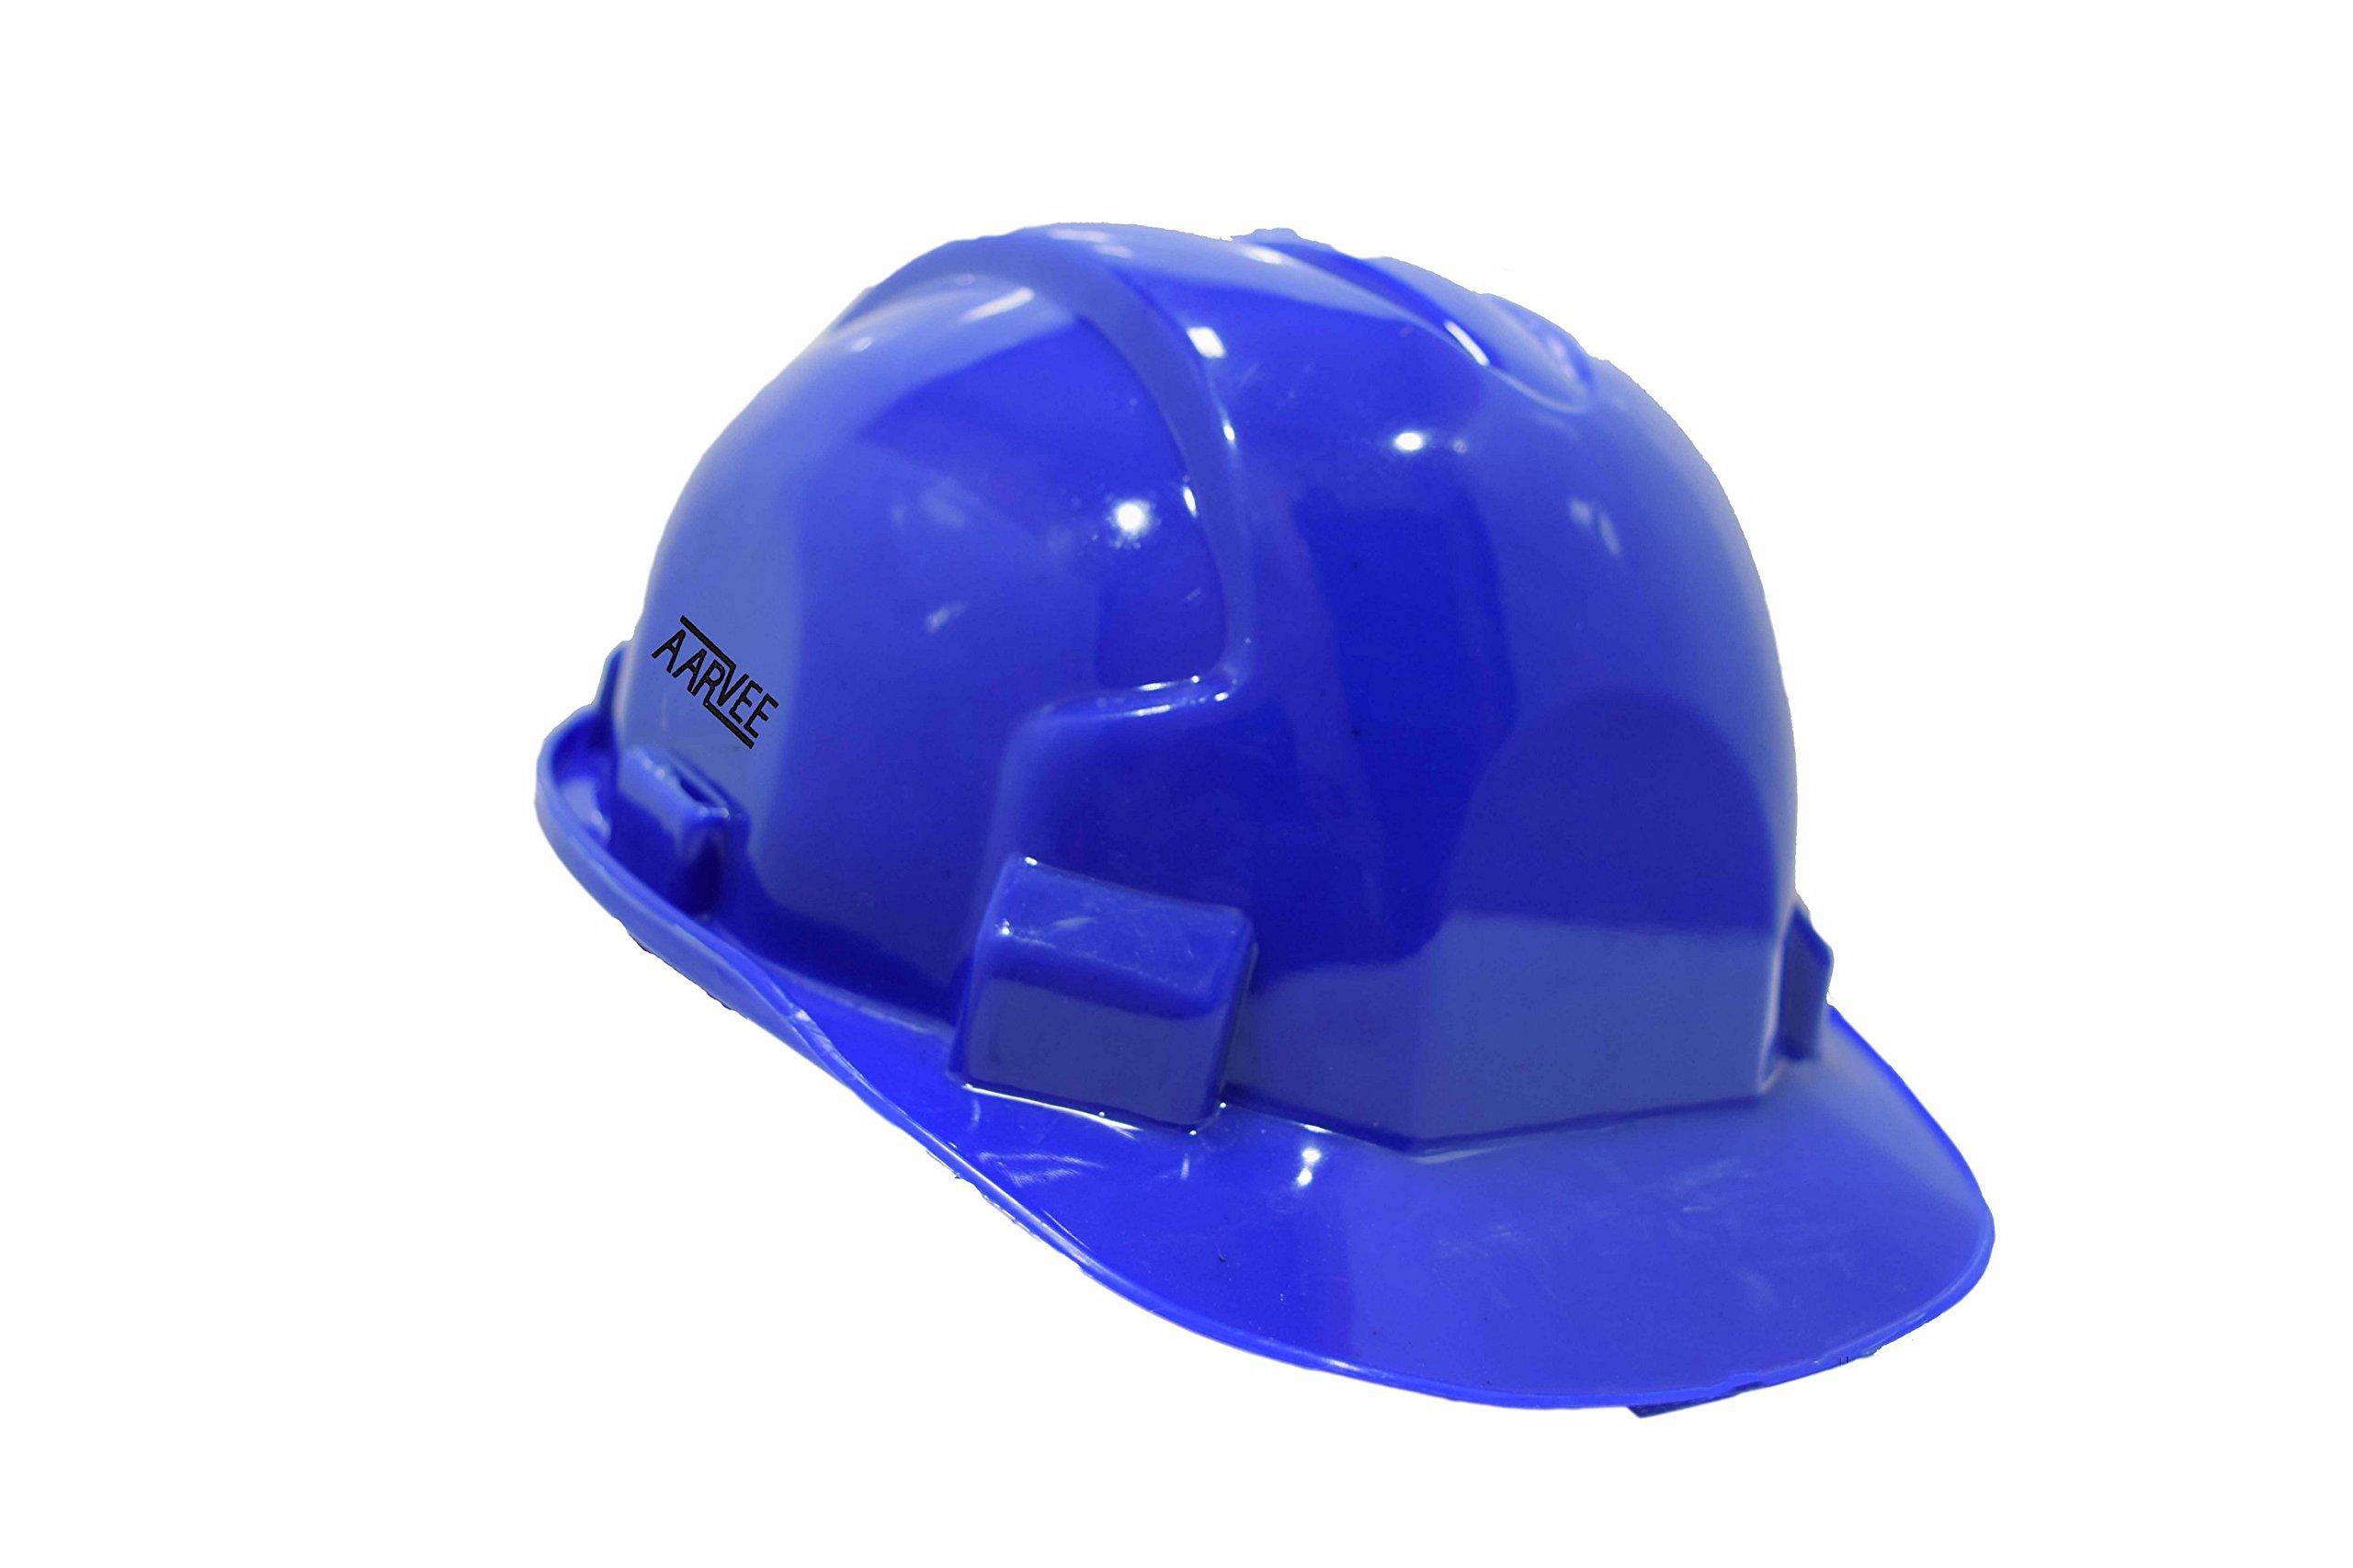 Aarvee Safety Helmet RV-H21 Nape Type - Blue (Pack of 1) (B079H2B75M) Amazon Price History, Amazon Price Tracker